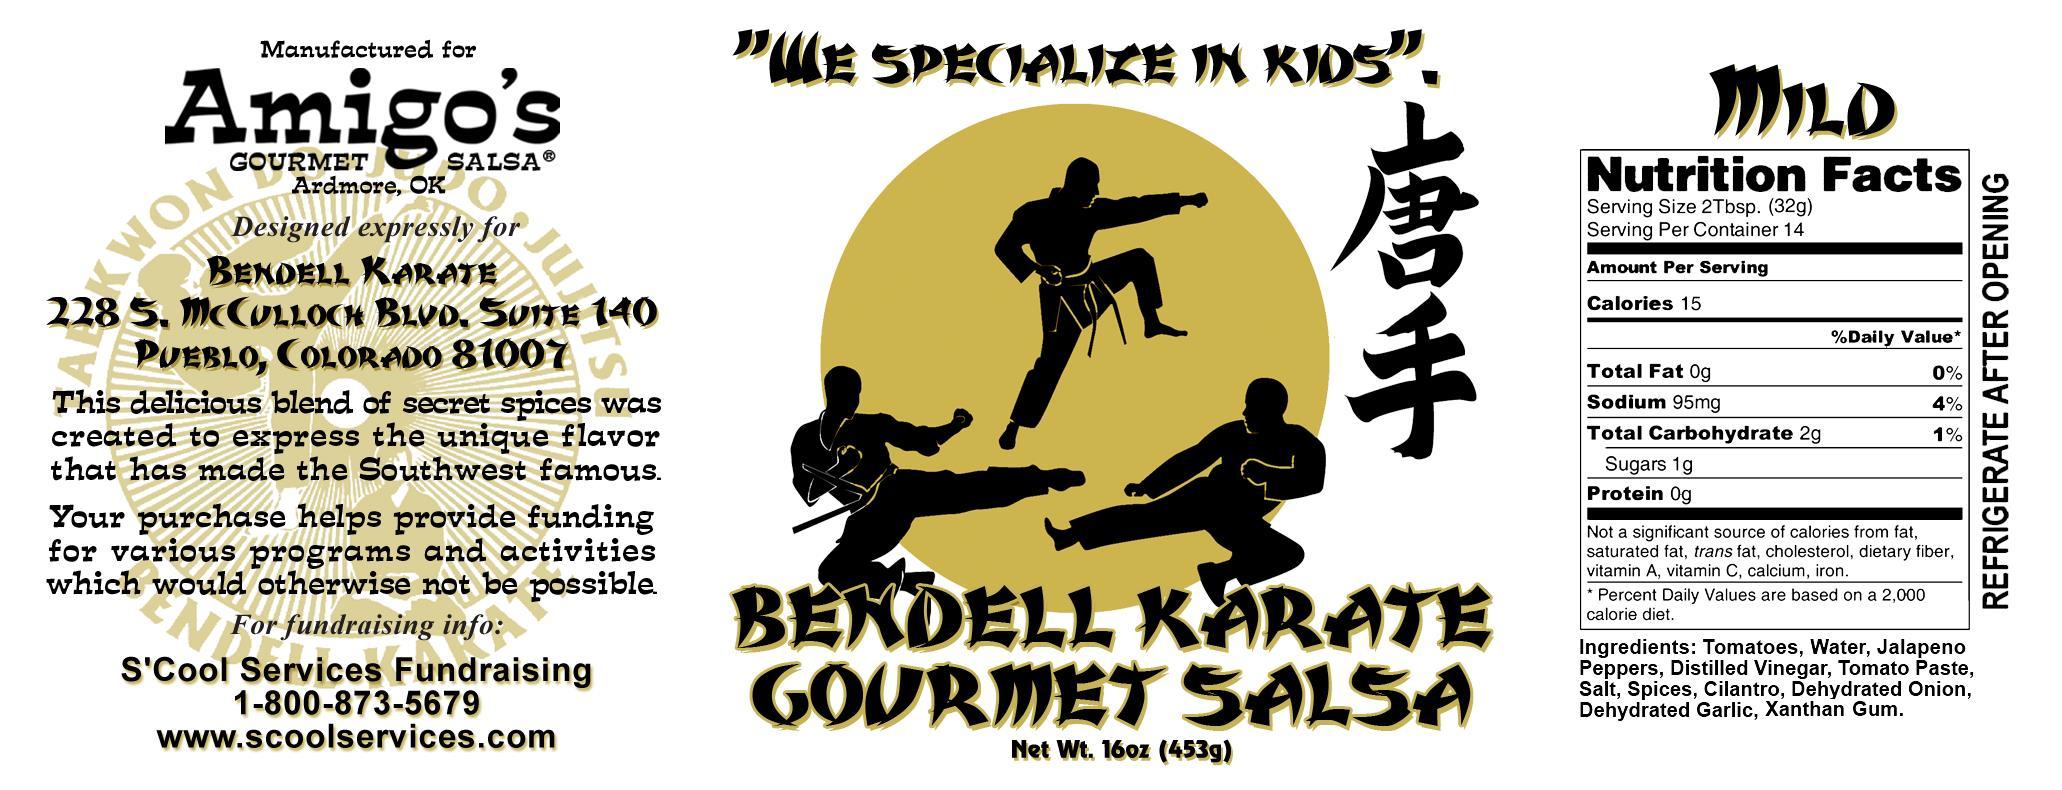 Bendell Karate Jar Label MILD.jpg